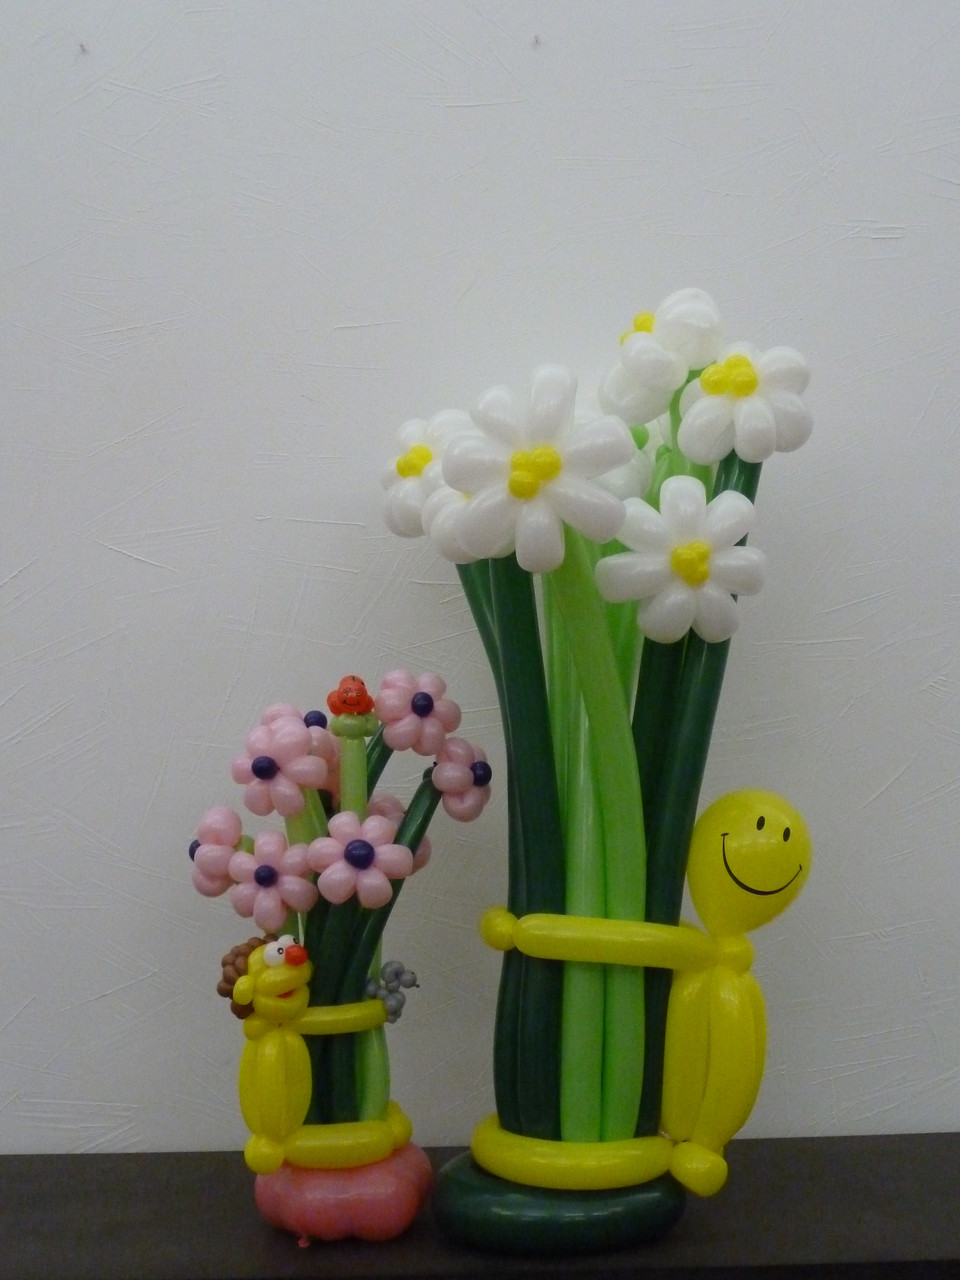 Ballonblumen twisten,Geburtstag ,  Blumenstrauß, Mr. toni balloni ch